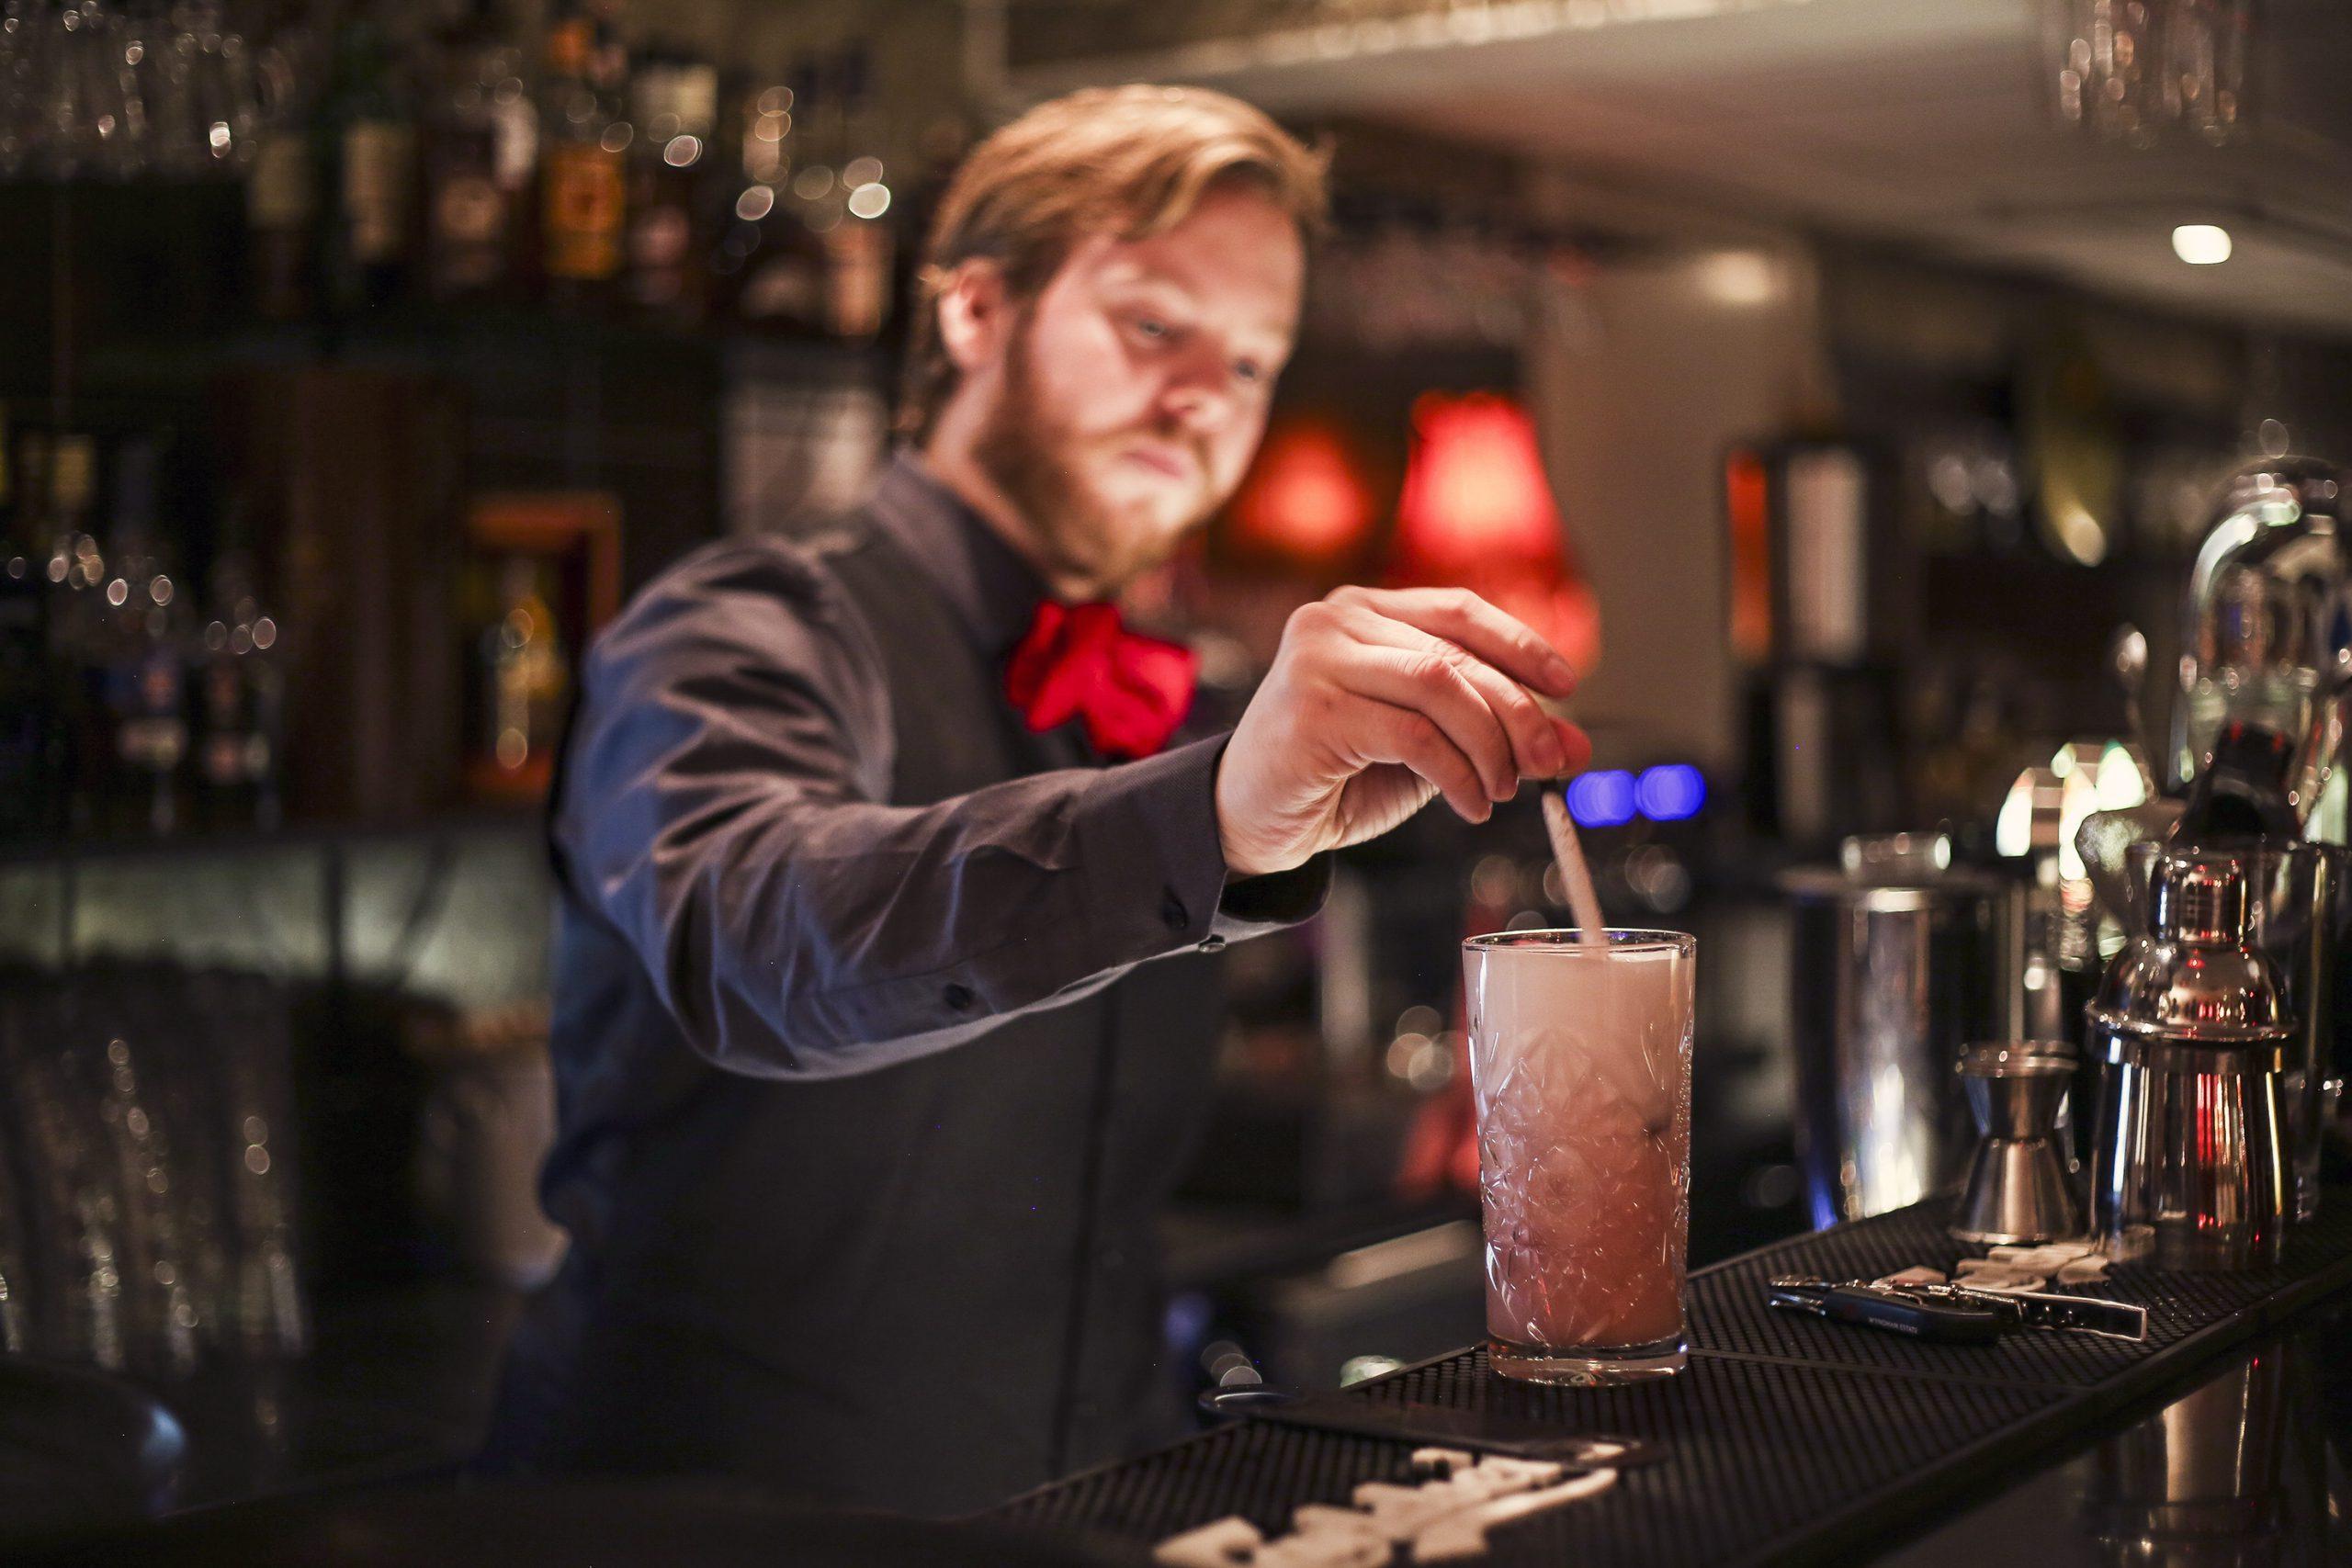 Bartender blandar en dring i baren på Agrill i Västerås. Foto: Pressbild/ Mikael Nystrand